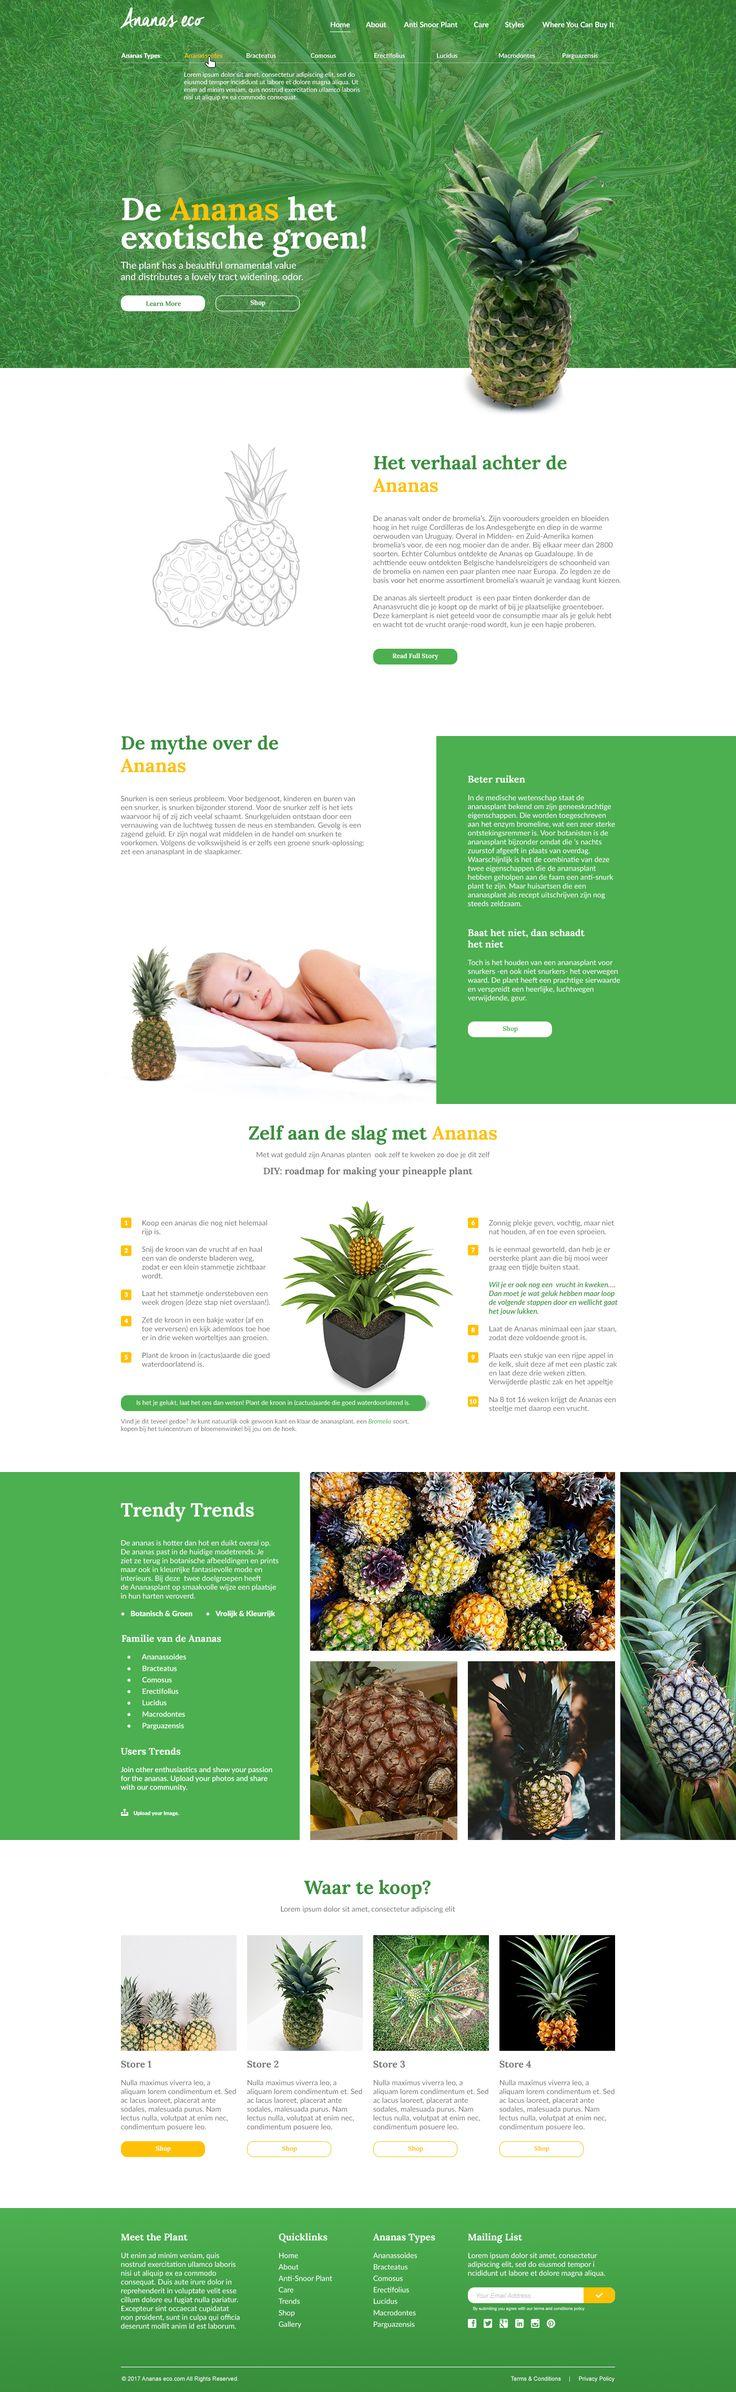 Ananas lovers website design.